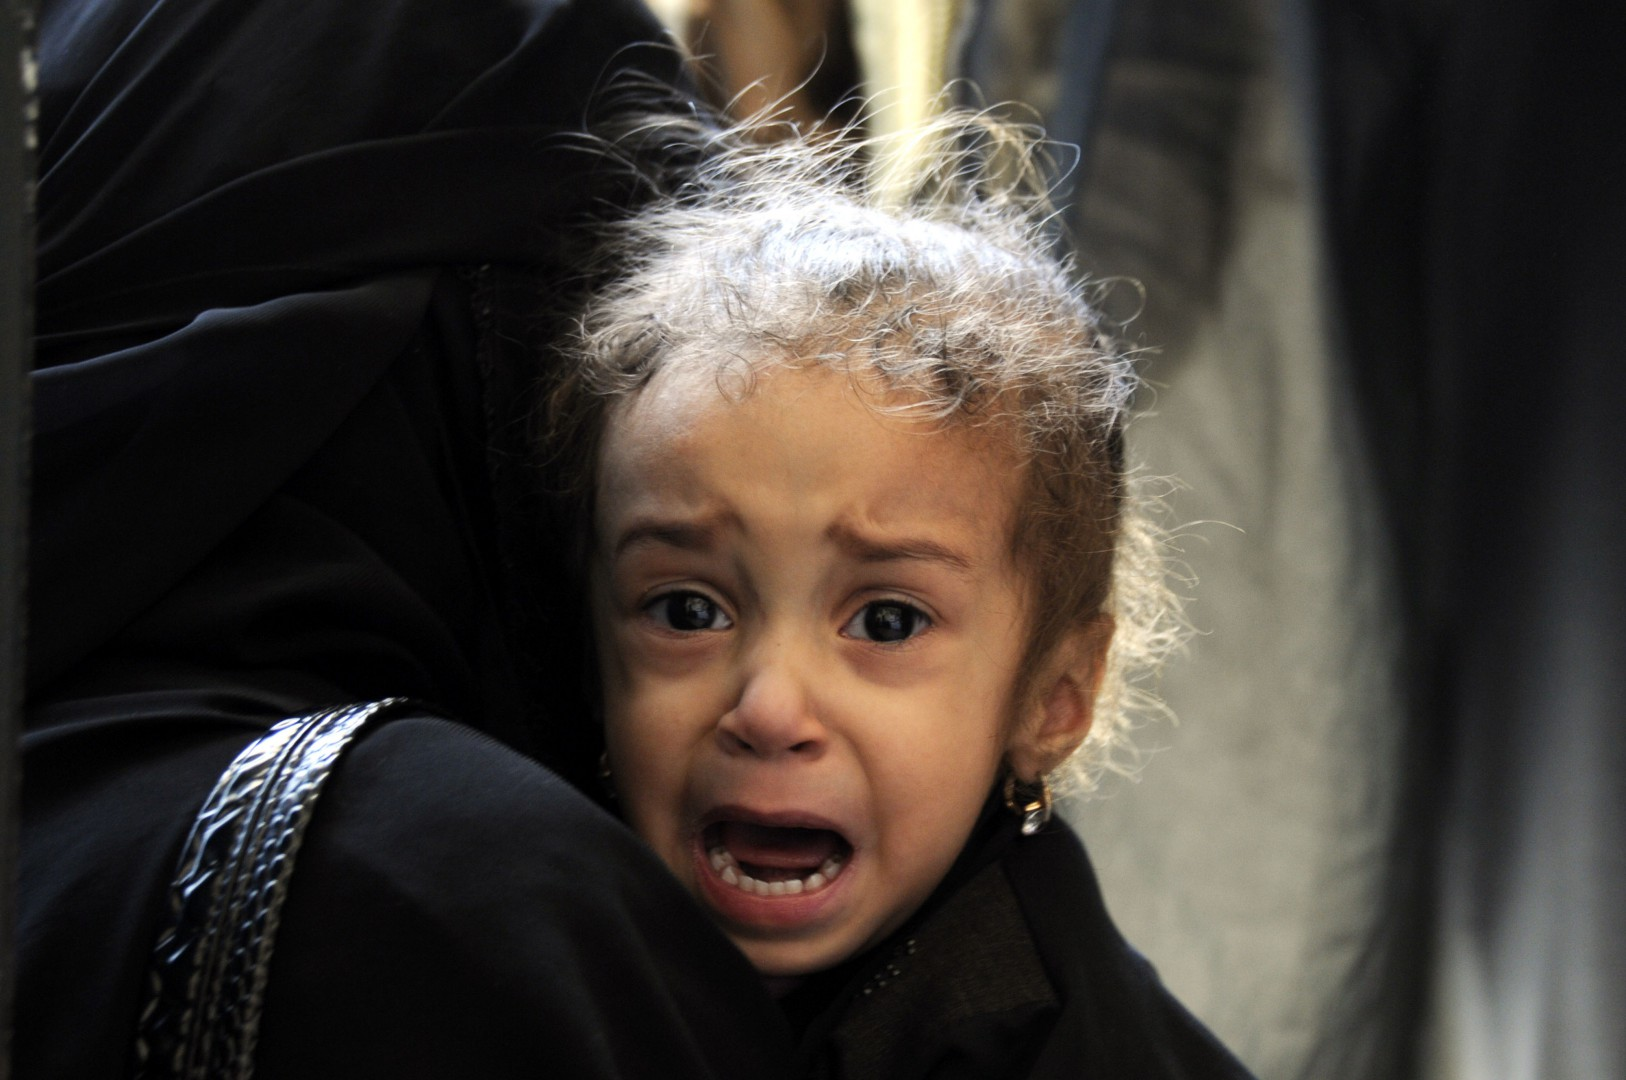 Una bambina in Yemen (LaPresse)